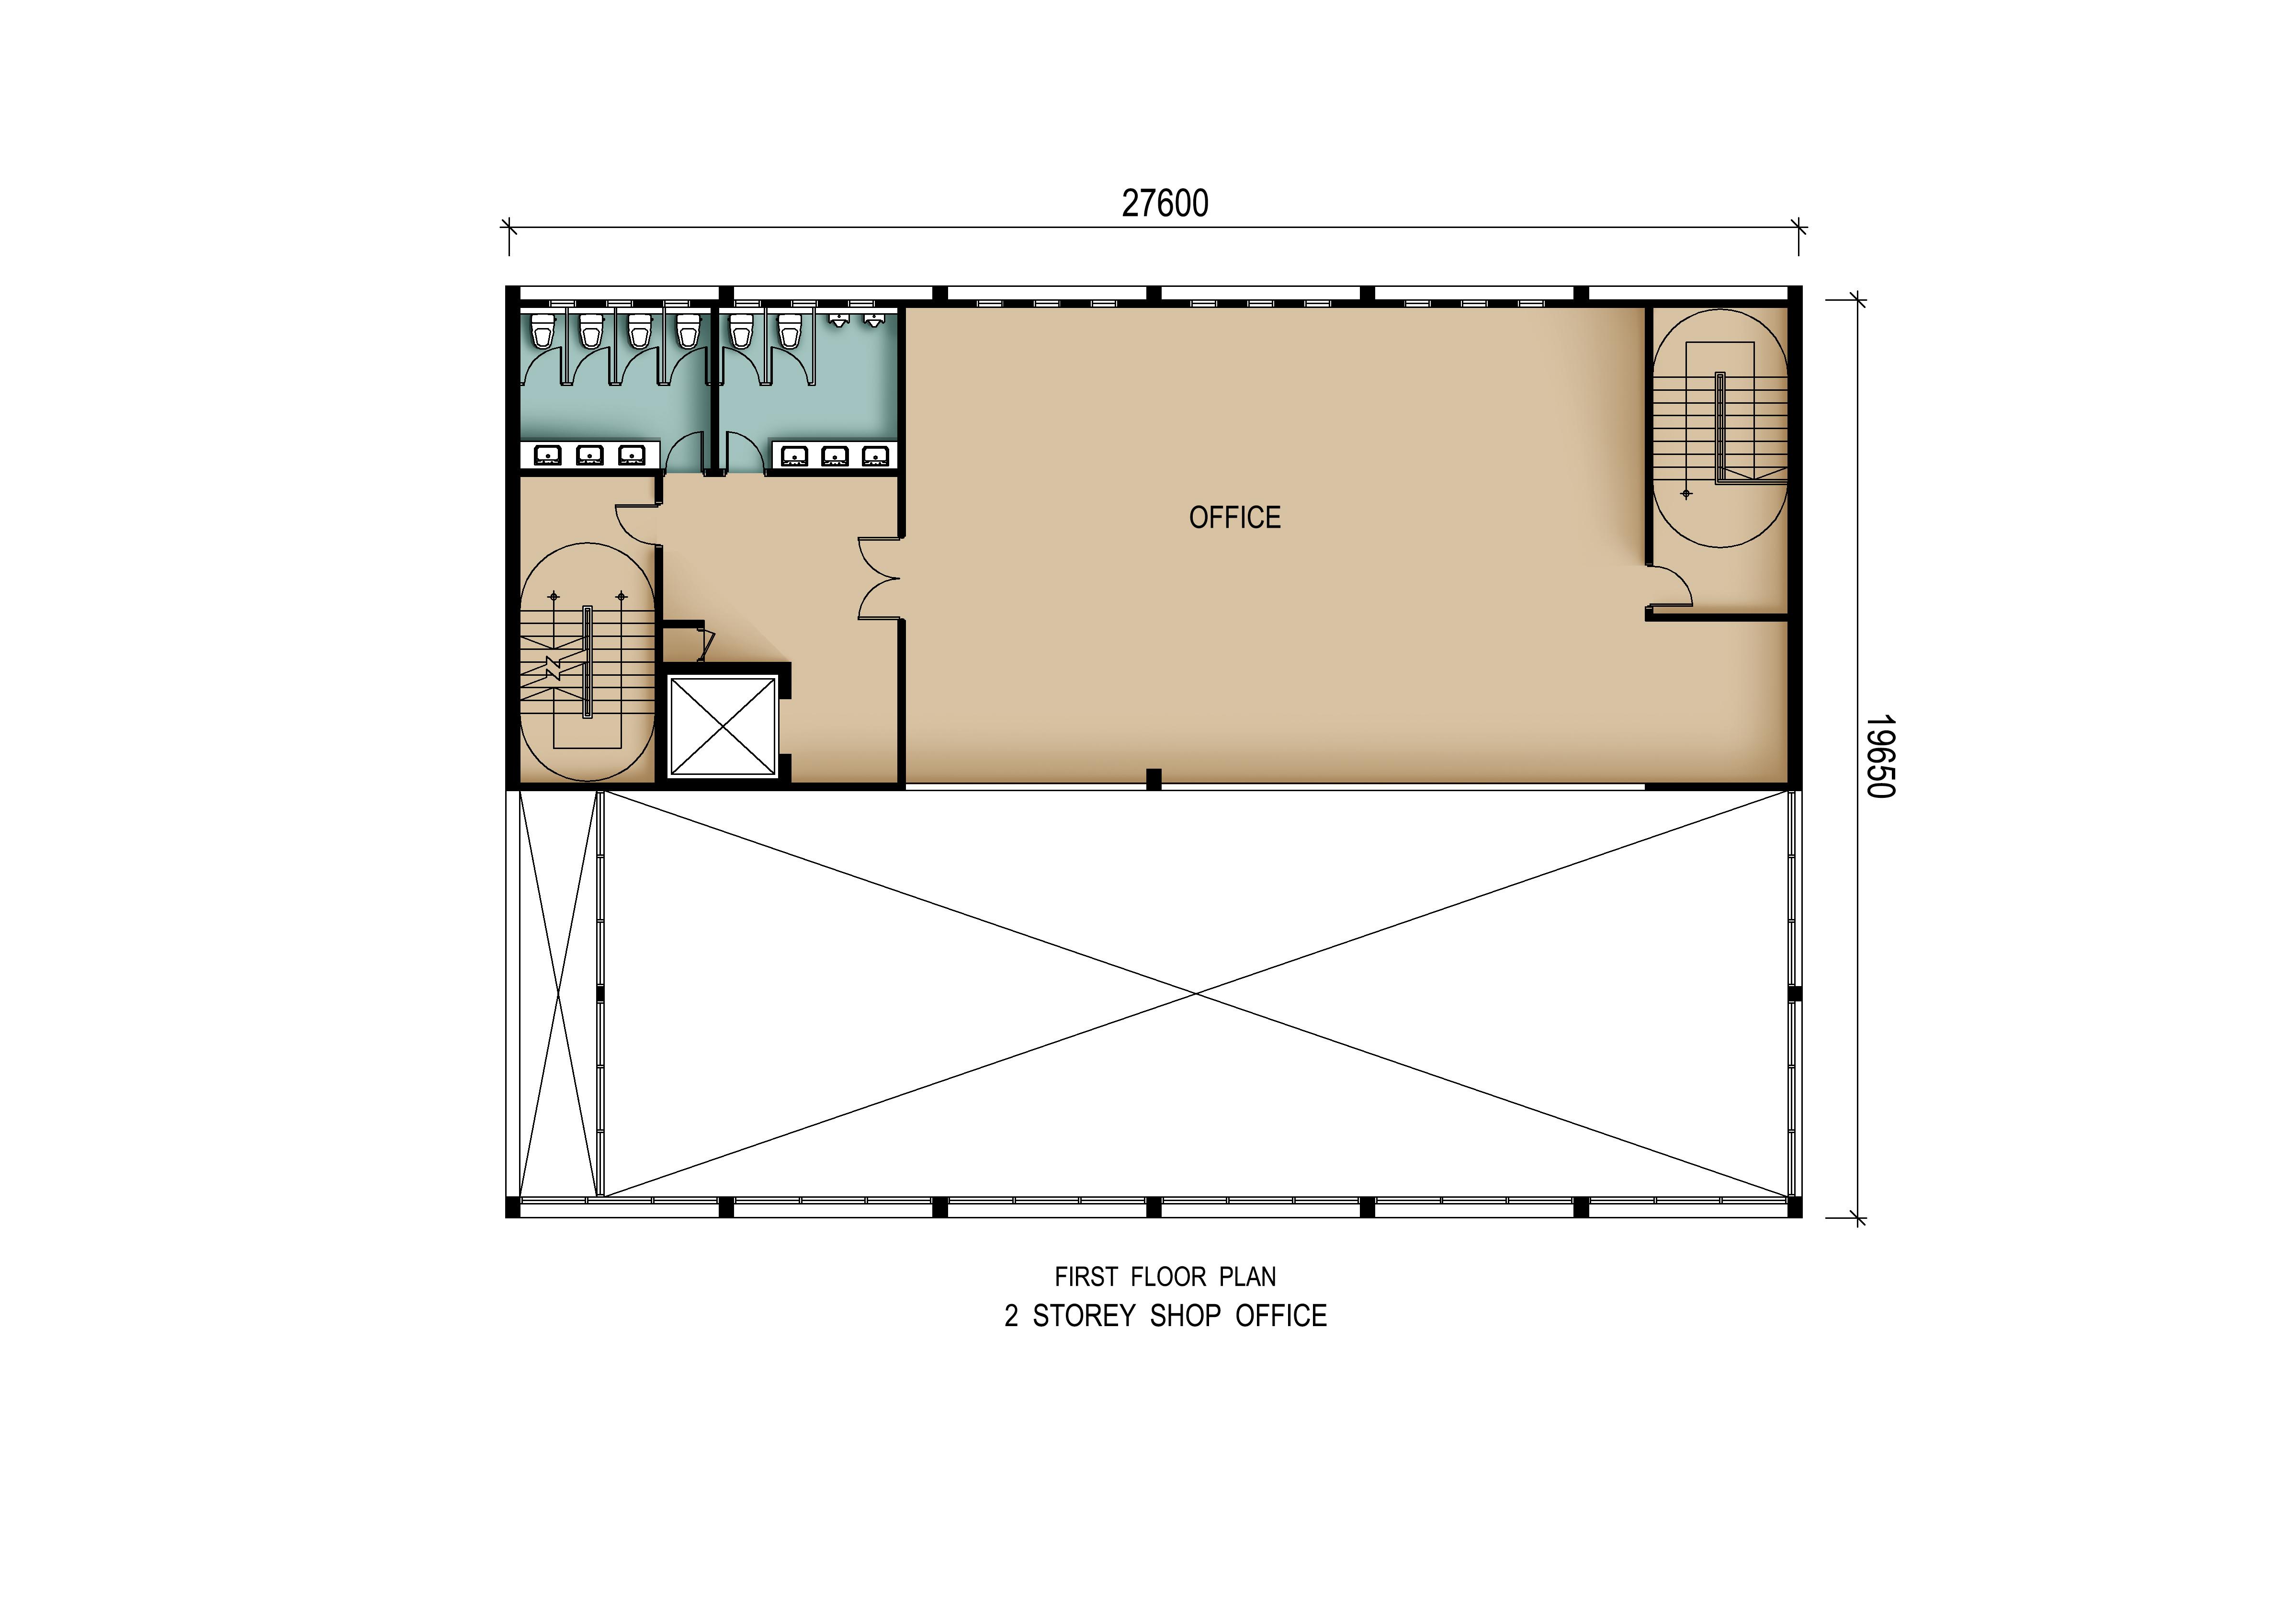 2 Storey Detached Shop Office (First Floor)